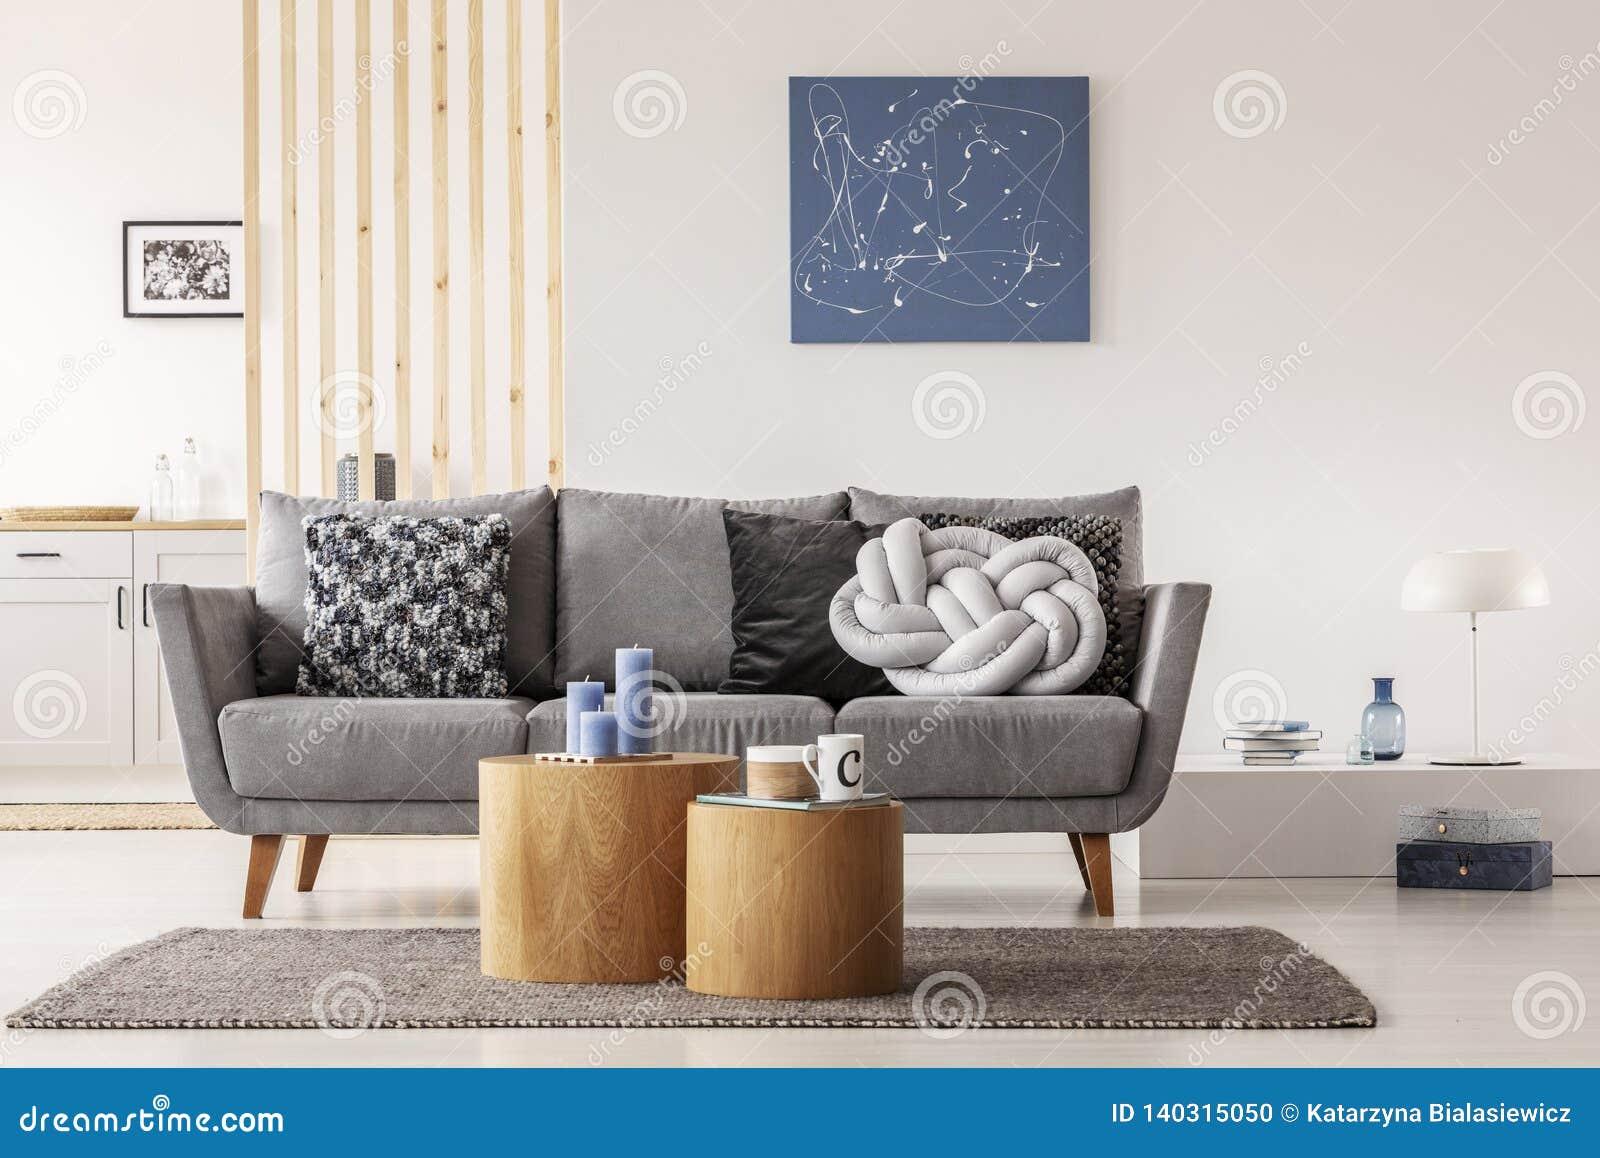 Pintura abstrata azul na parede branca da sala de visitas contemporânea interior com o canapé cinzento com descansos